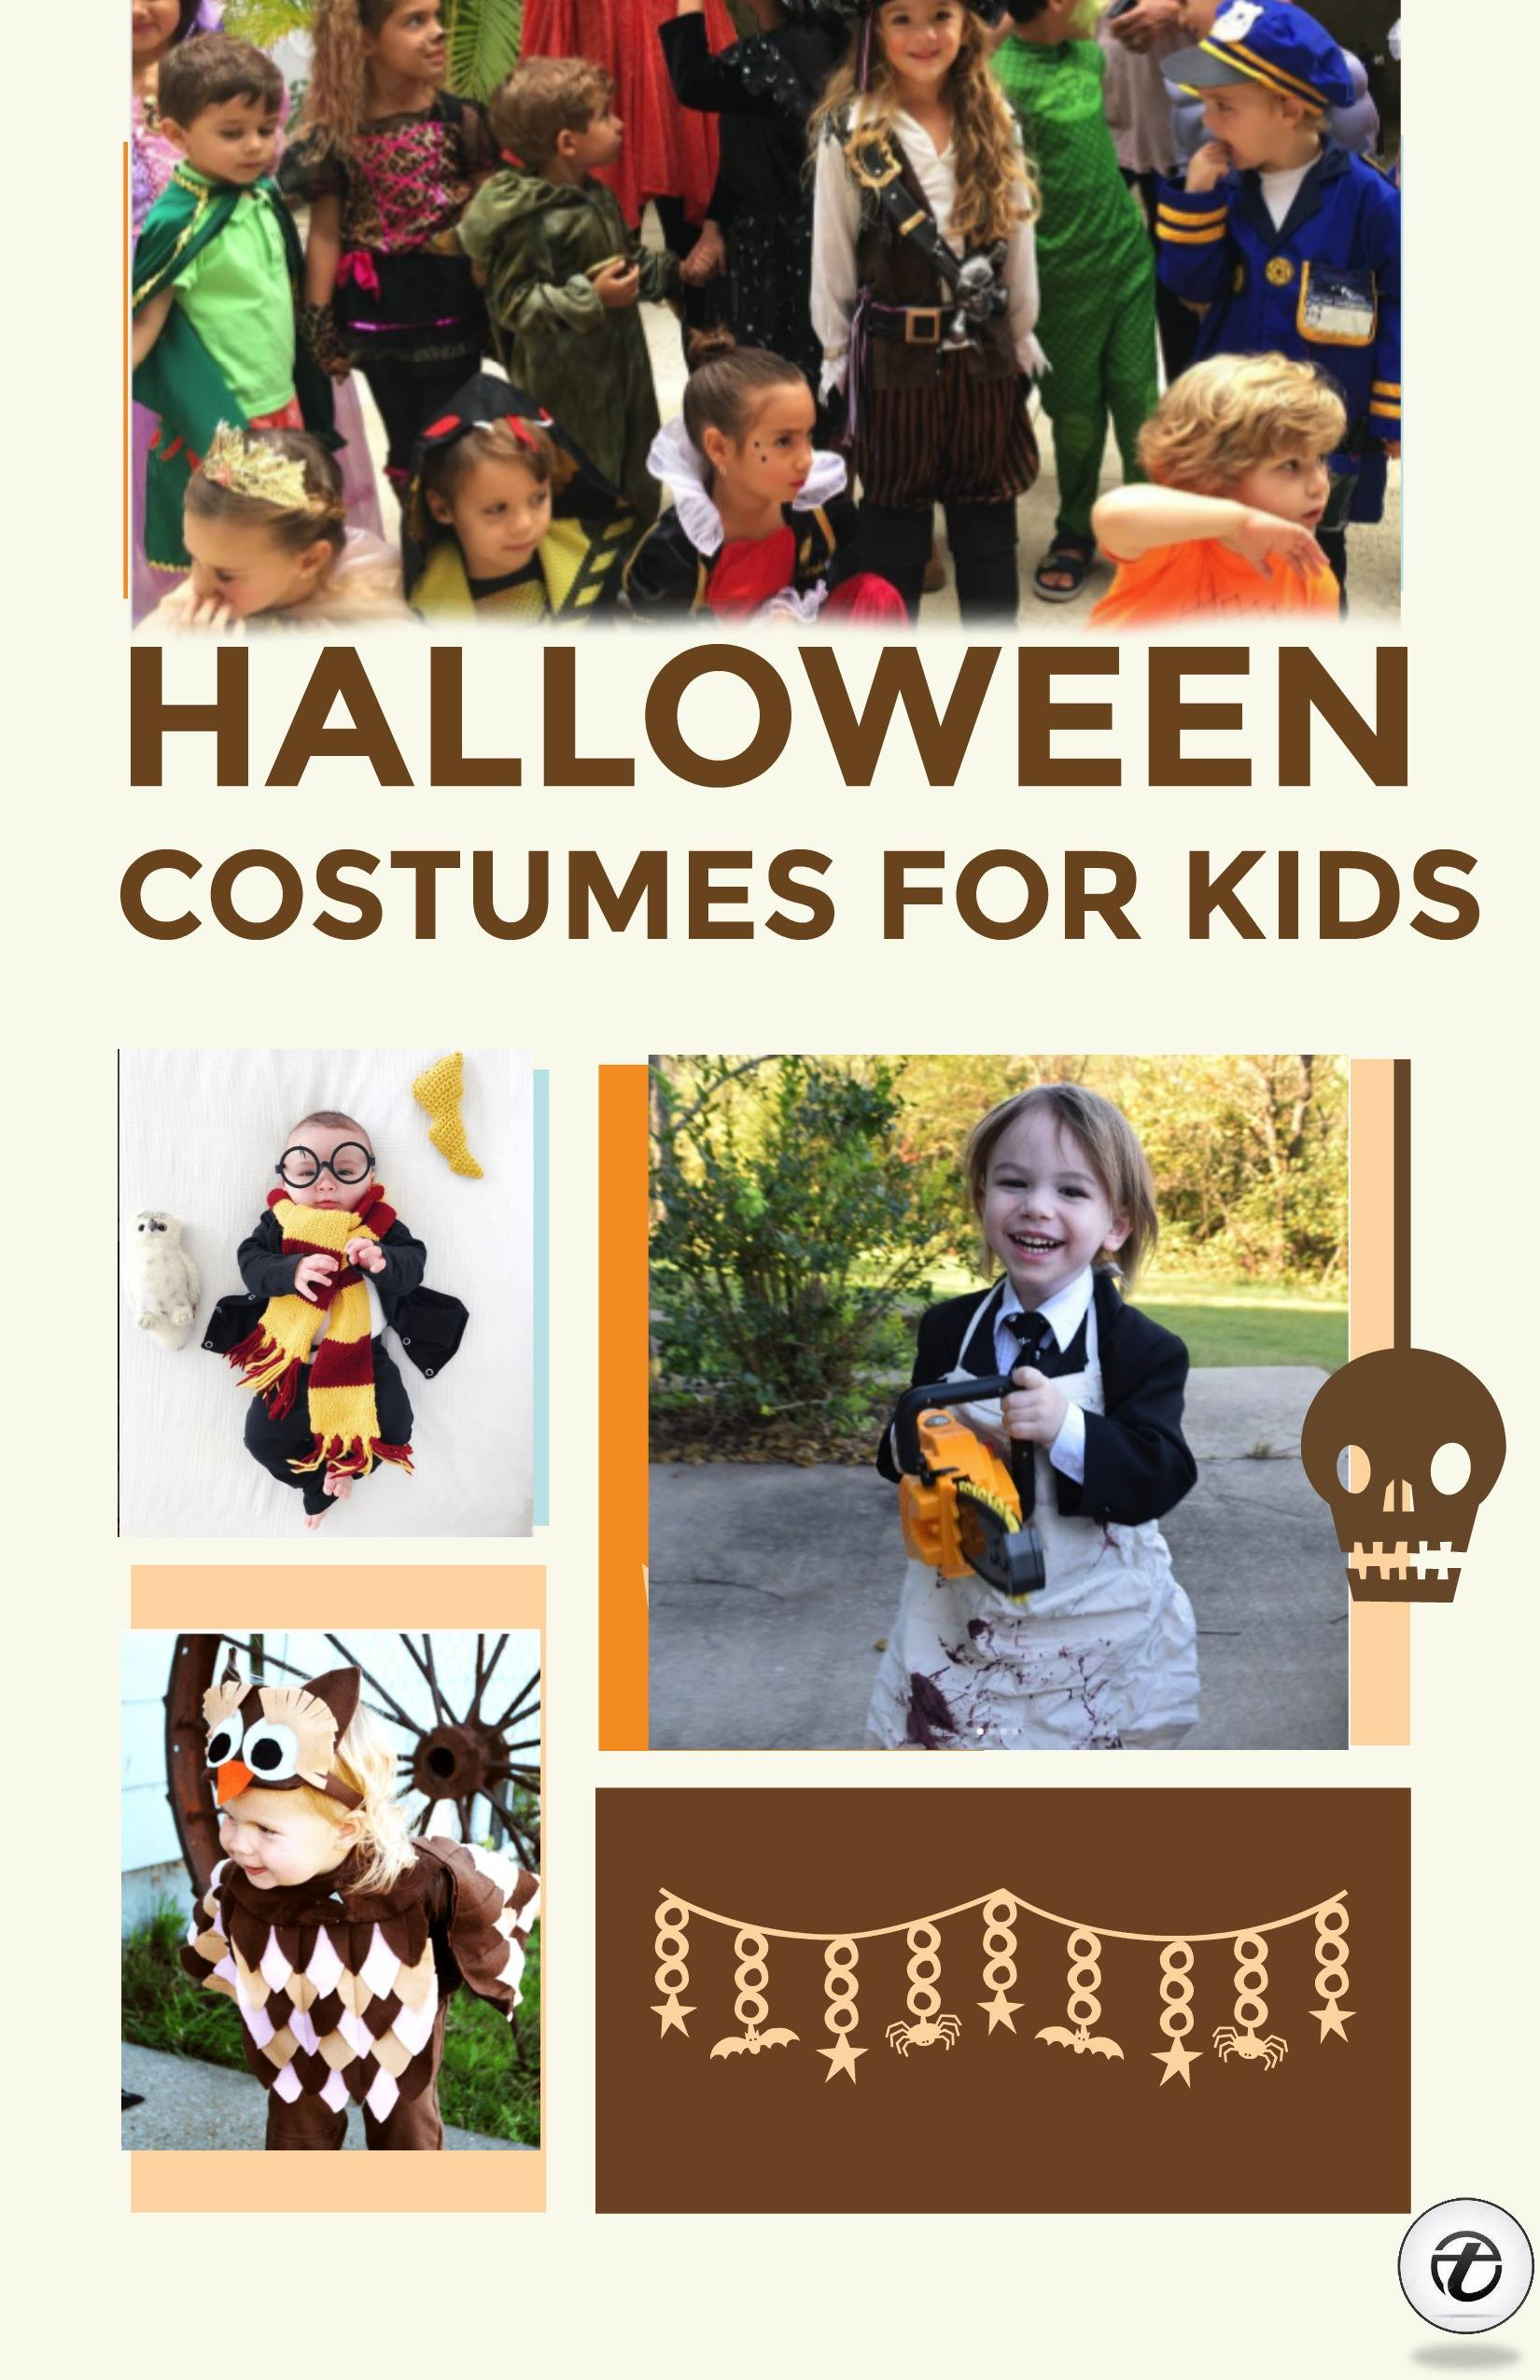 BEST-HALLOWEEN-COSTUMES-FOR-KIDS Kids Halloween Costumes - Top 10 Halloween Costumes for Kids